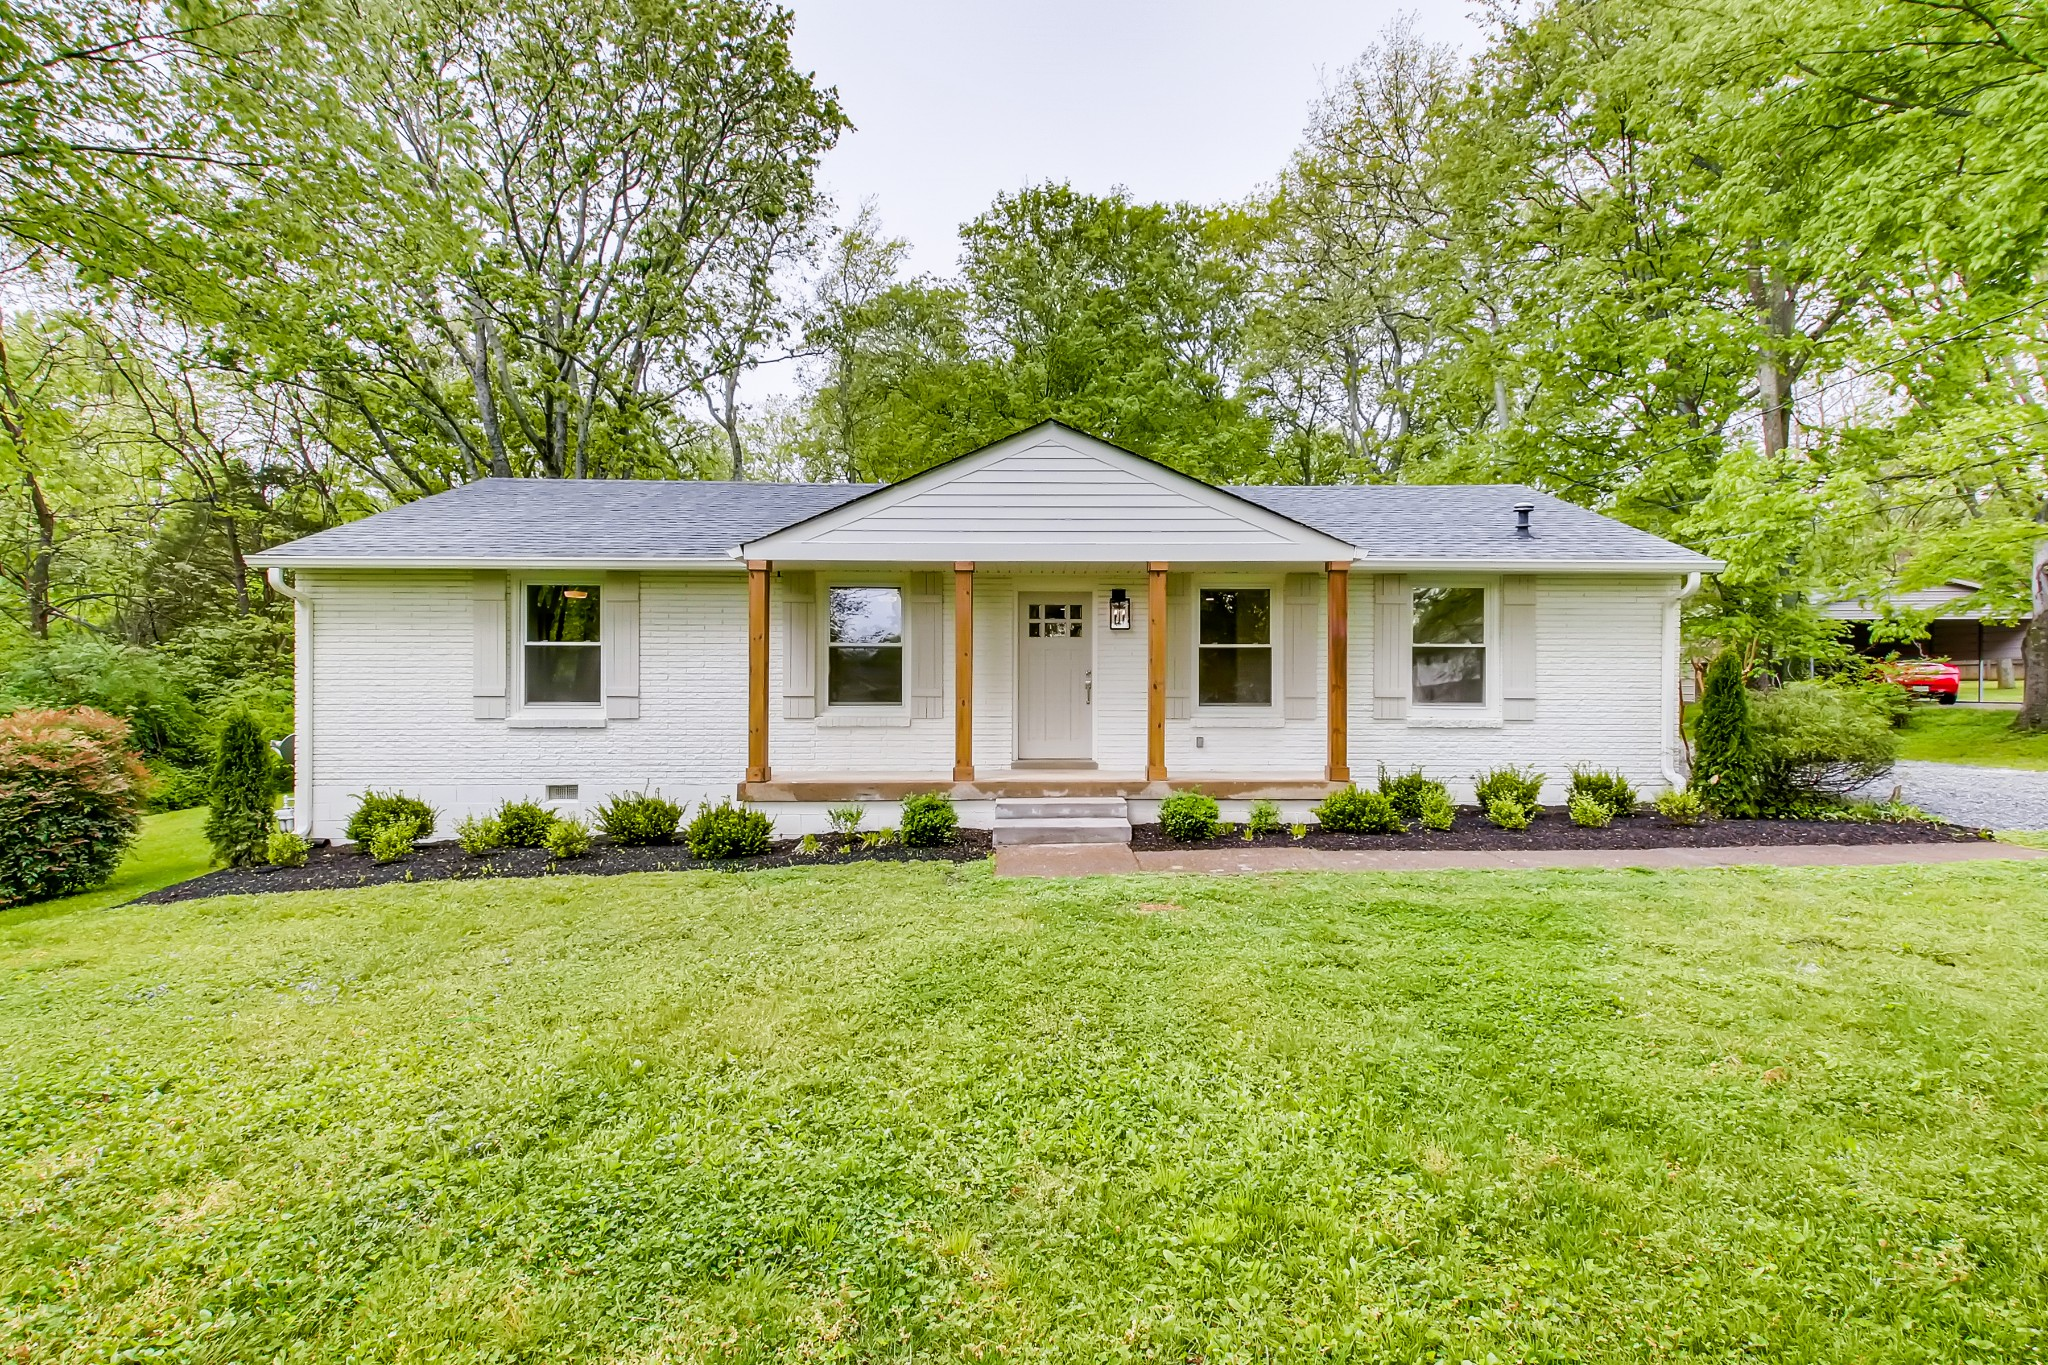 239 Lakeside Park Dr Property Photo - Hendersonville, TN real estate listing